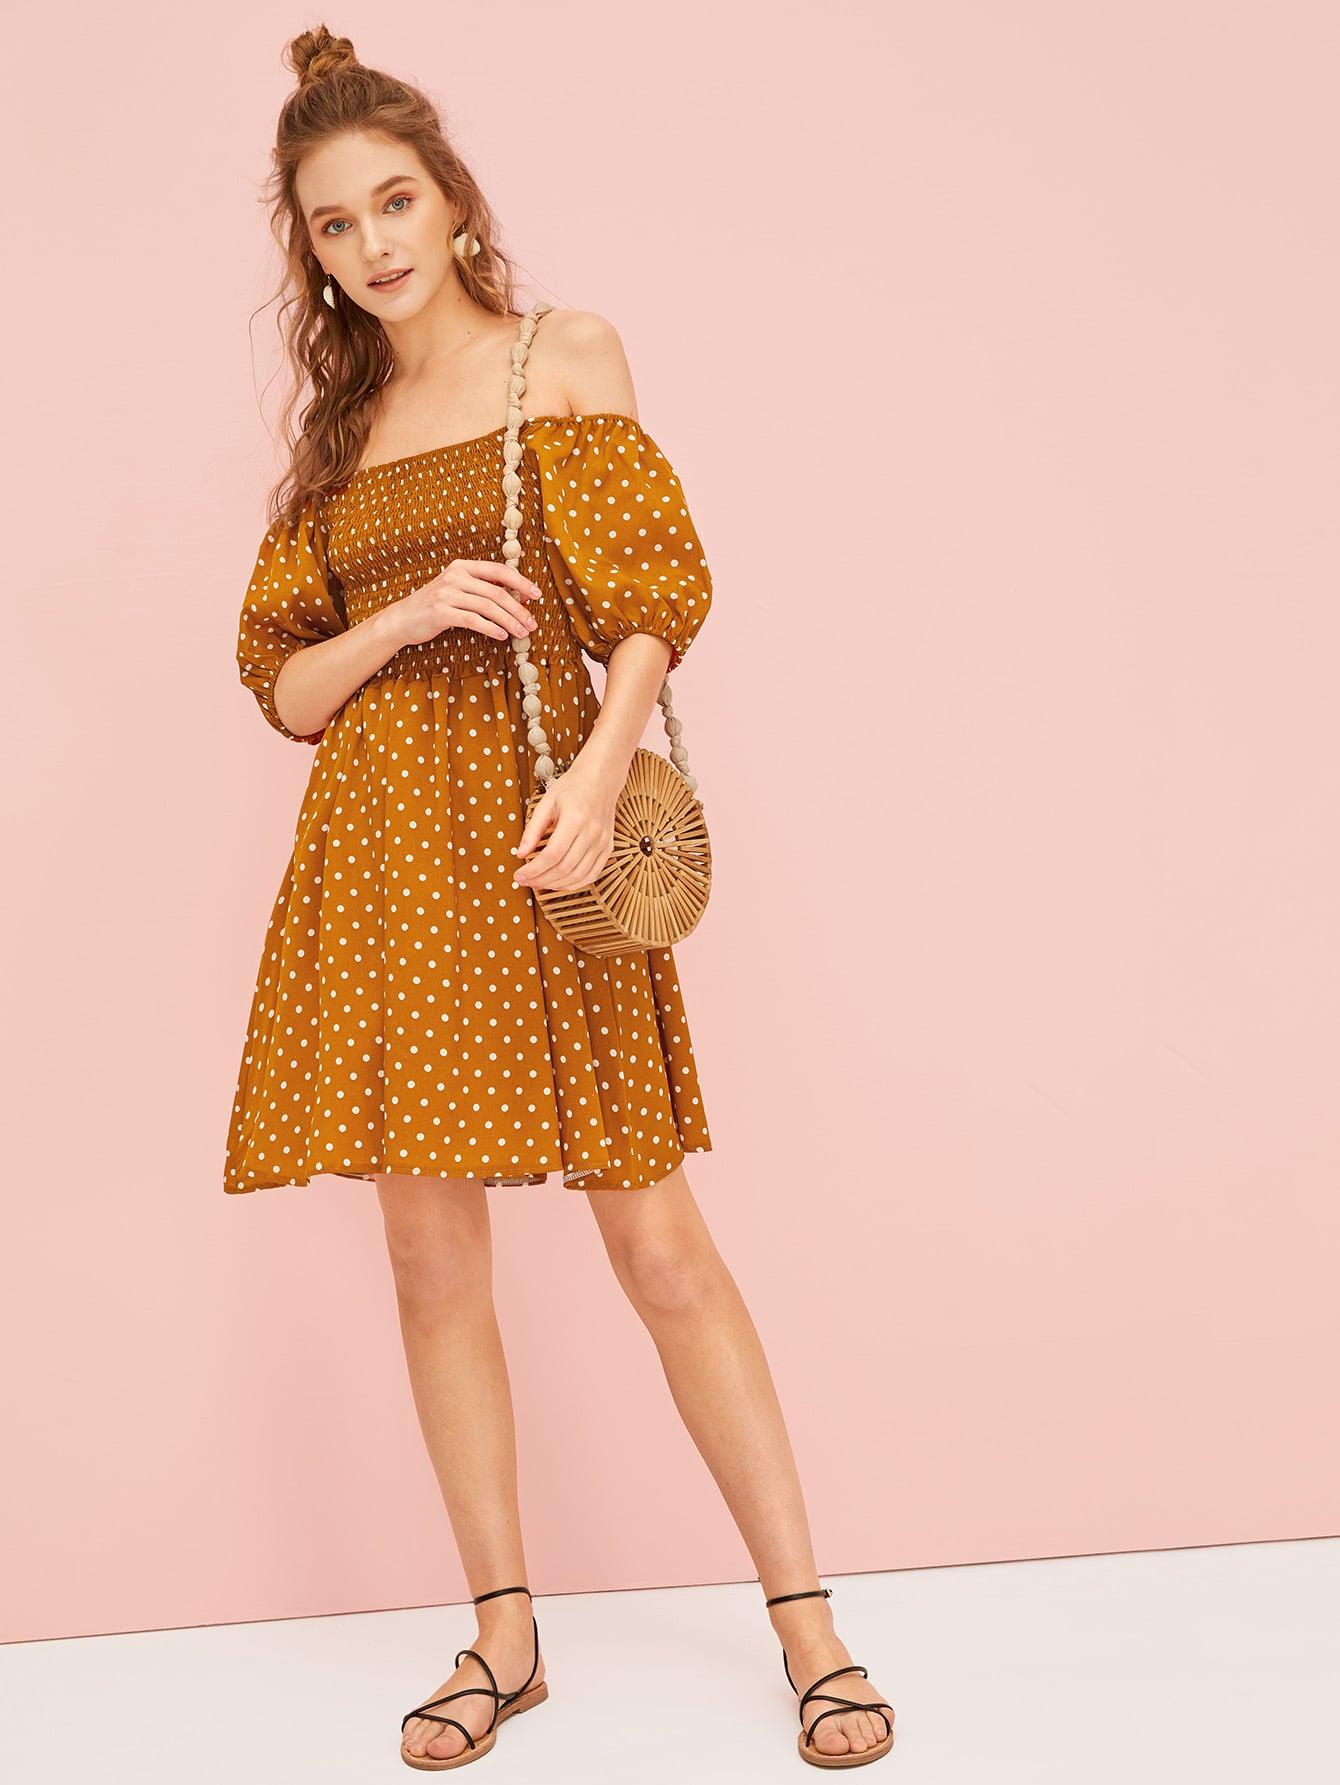 8389bae35de Polka Dot Shirred Swing Dress EmmaCloth-Women Fast Fashion Online